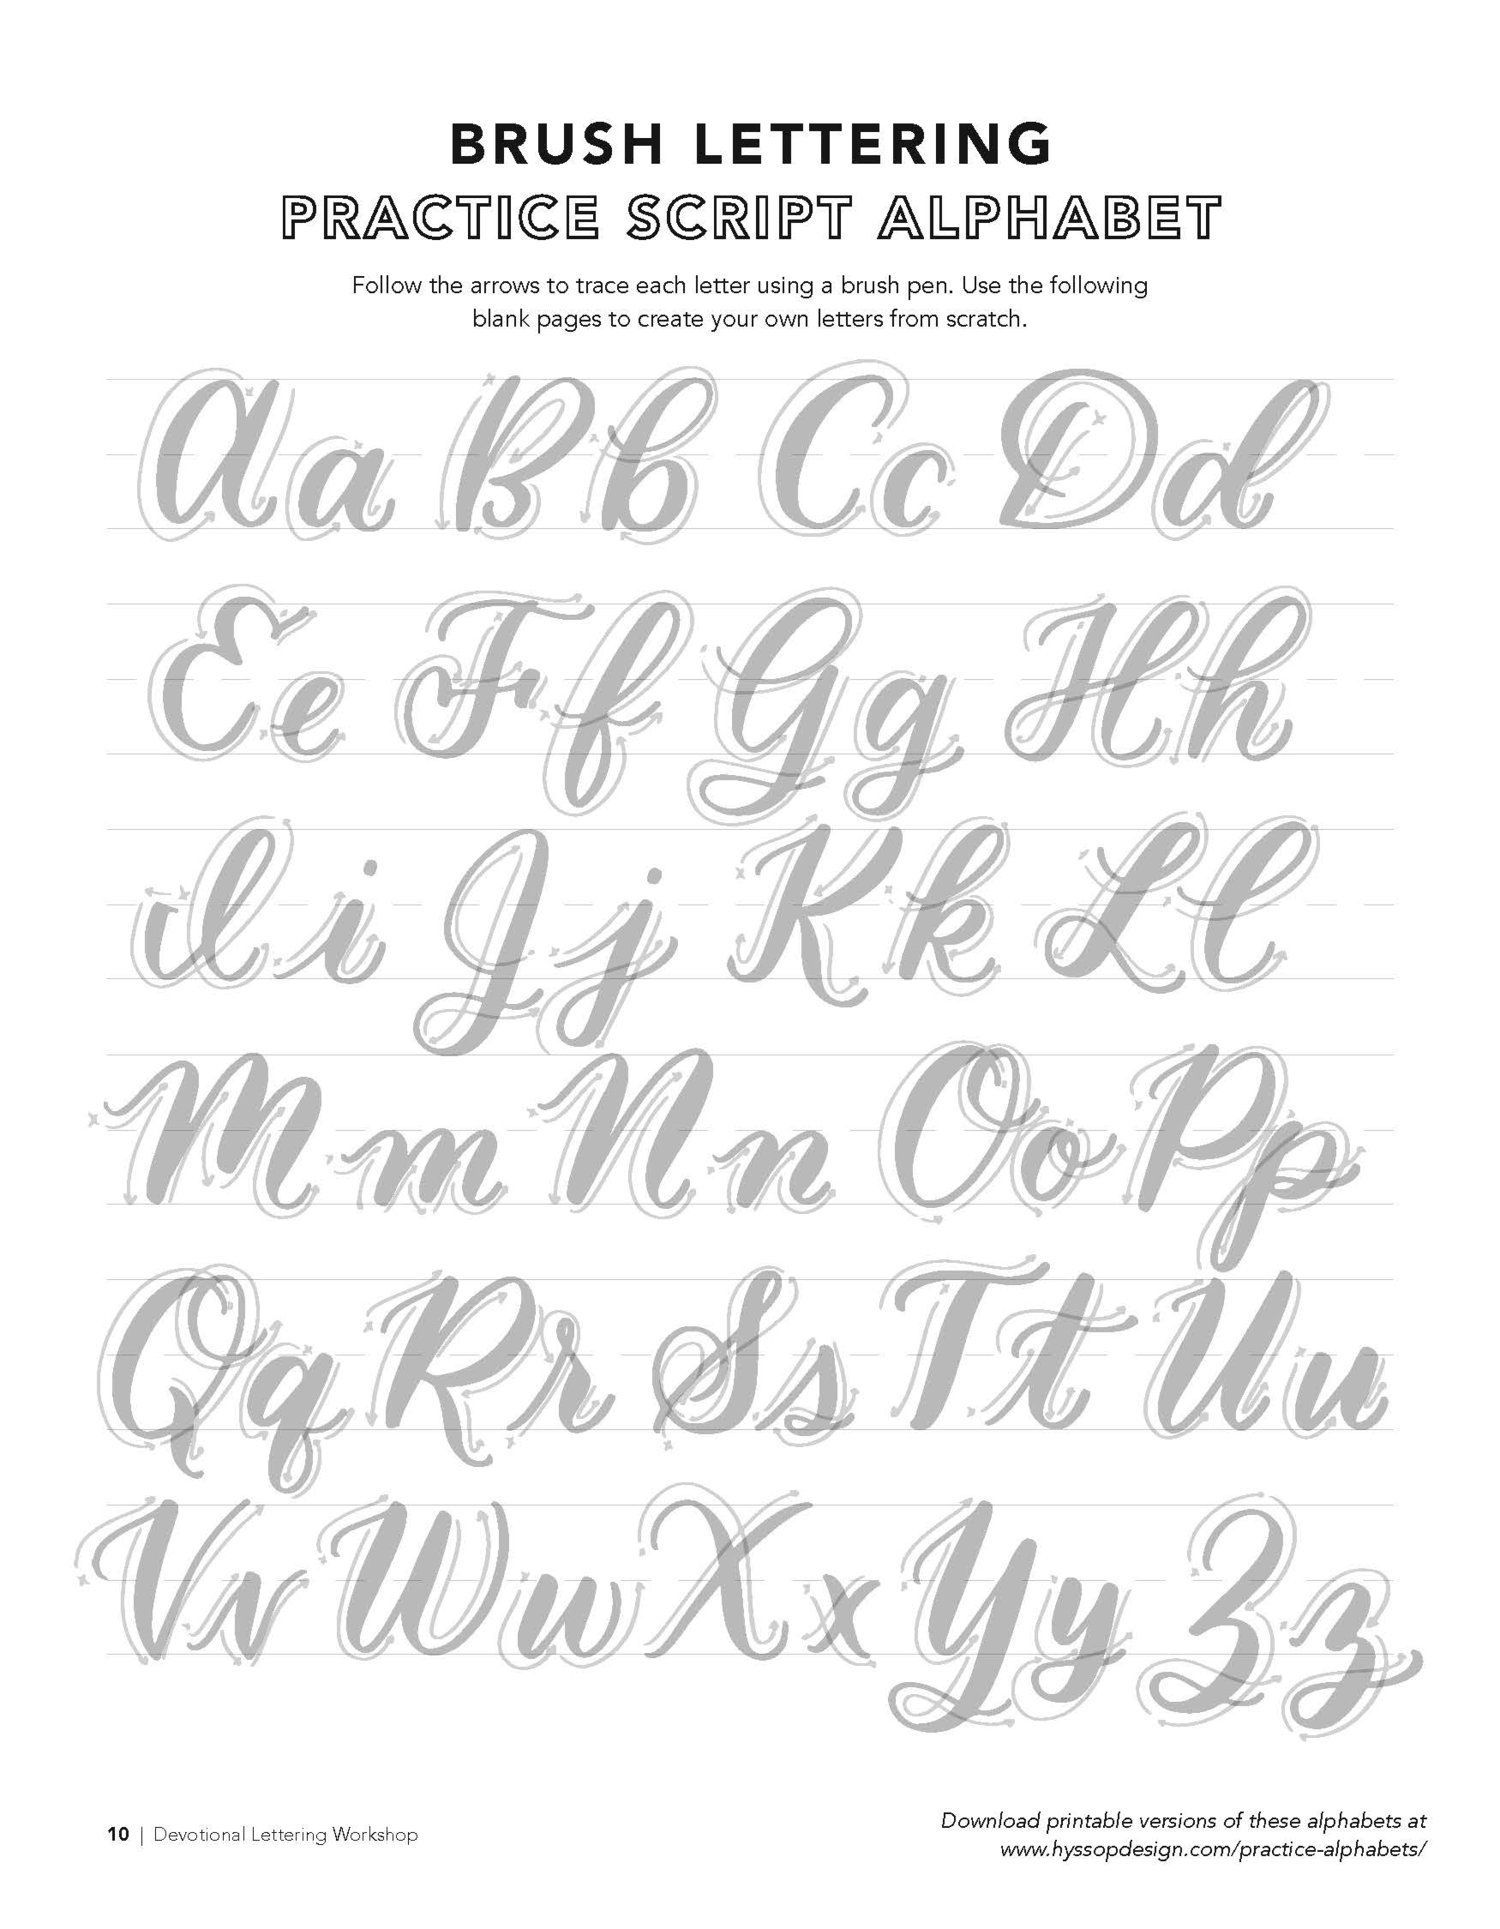 Predownload: Free Calligraphy Alphabets Calligraphy Free Calligraphy Alphabets Jacy Corral Hyssop Brush Lettering Worksheet Lettering Alphabet Hand Lettering Worksheet [ 1929 x 1500 Pixel ]